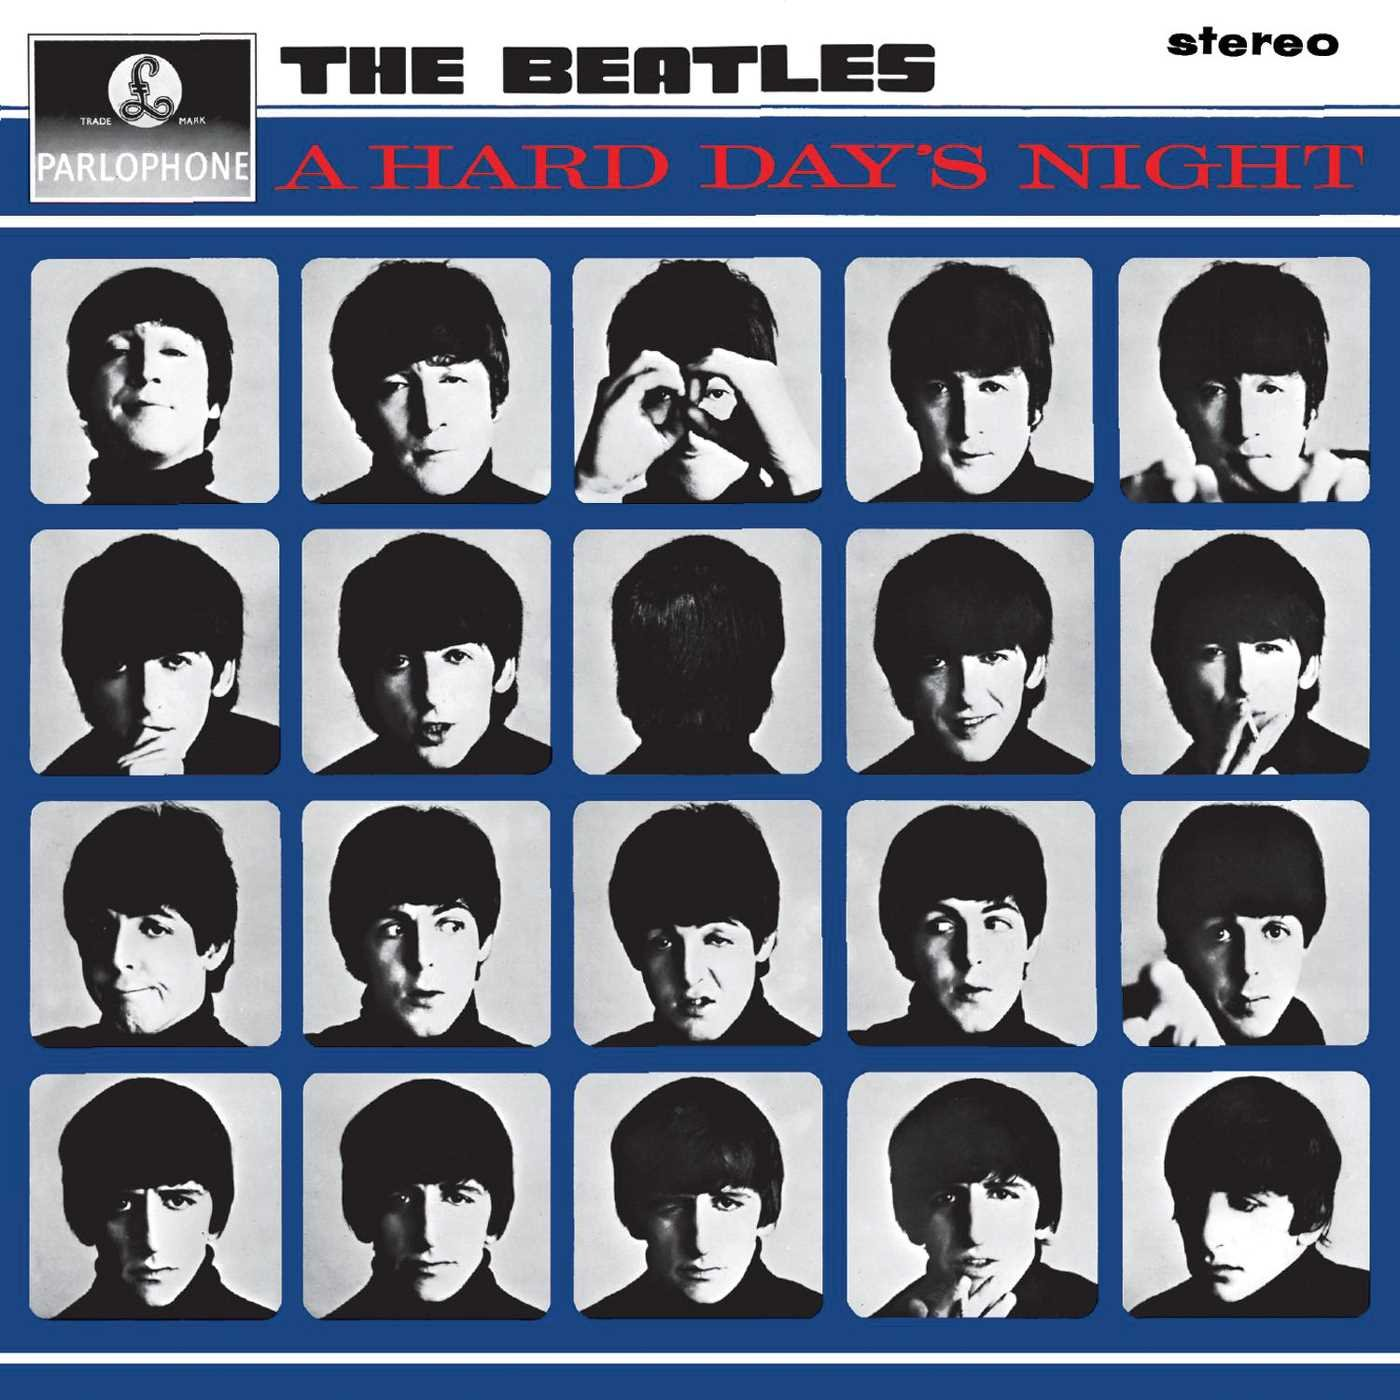 15a434b1 The Beatles - A Hard Day's Night - Amazon.com Music